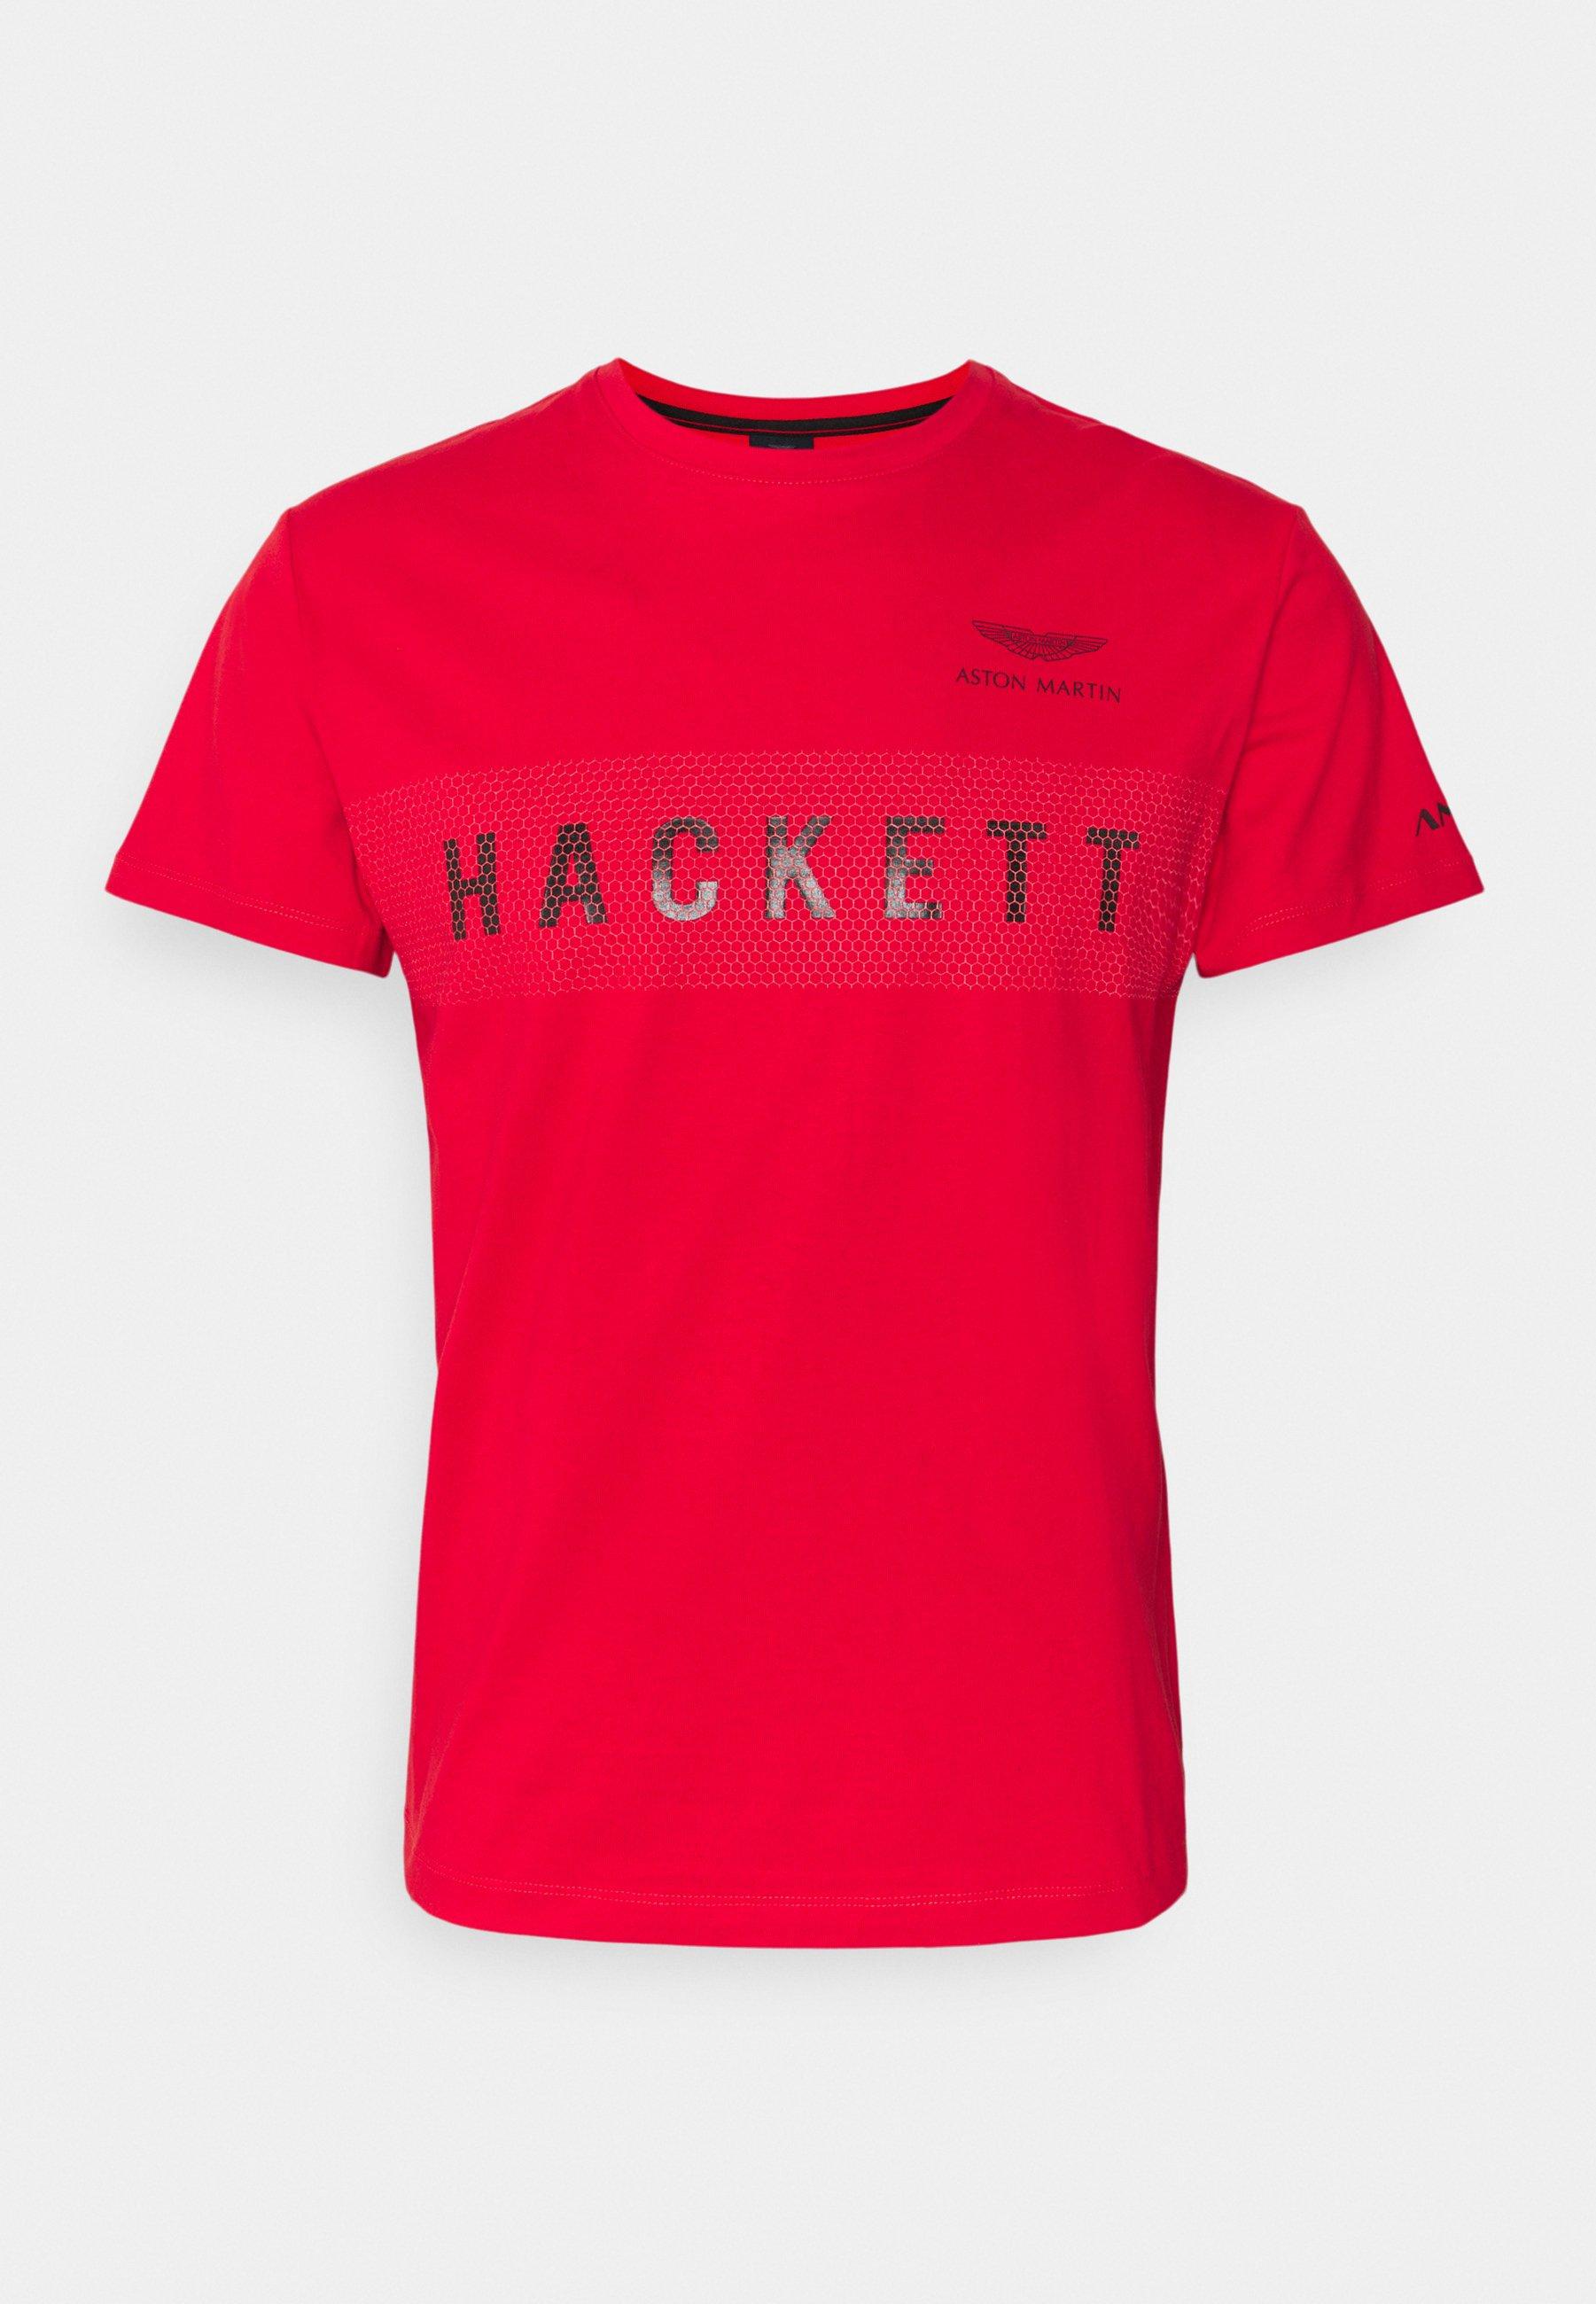 Hackett Aston Martin Racing Hackett Tee T Shirt Print Red Rot Zalando De